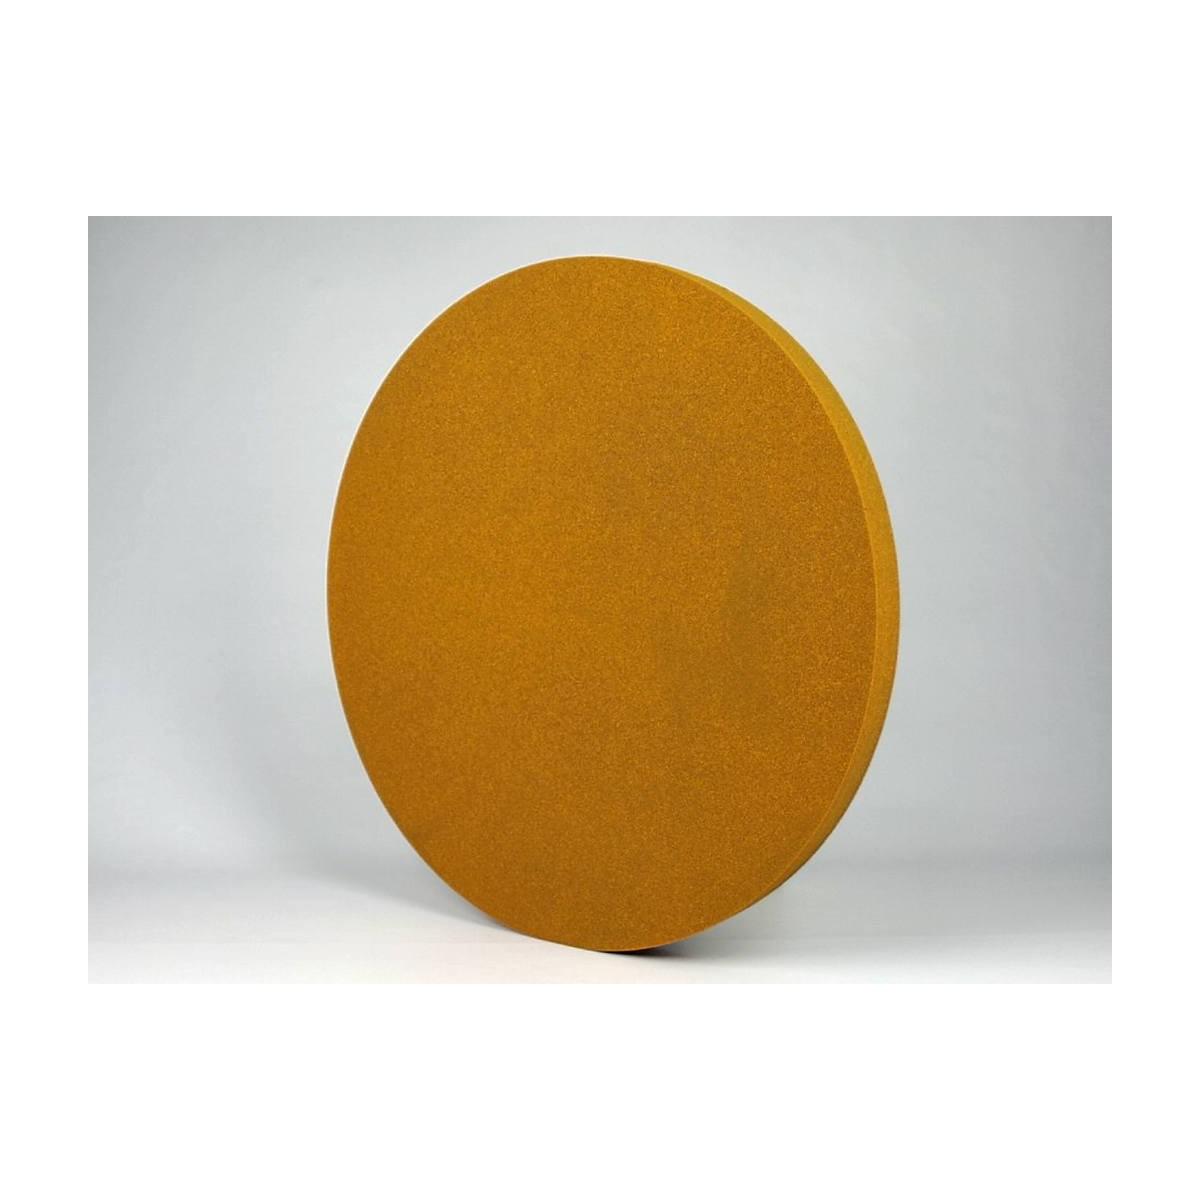 circulo acustico naranja eliacoustic circle Pure Orange